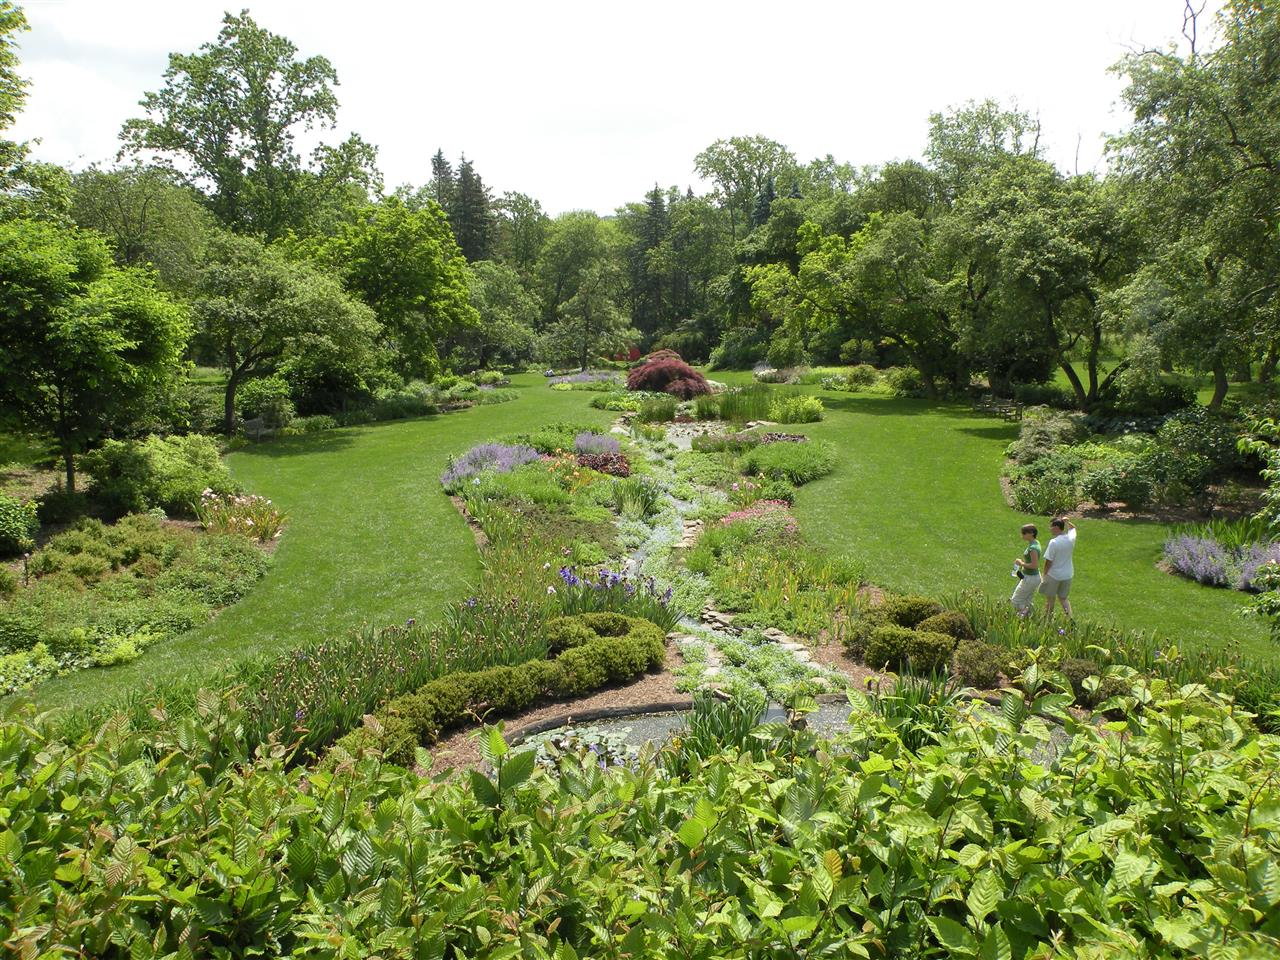 Water garden at Ladew Topiary Garden, Monkton, MD